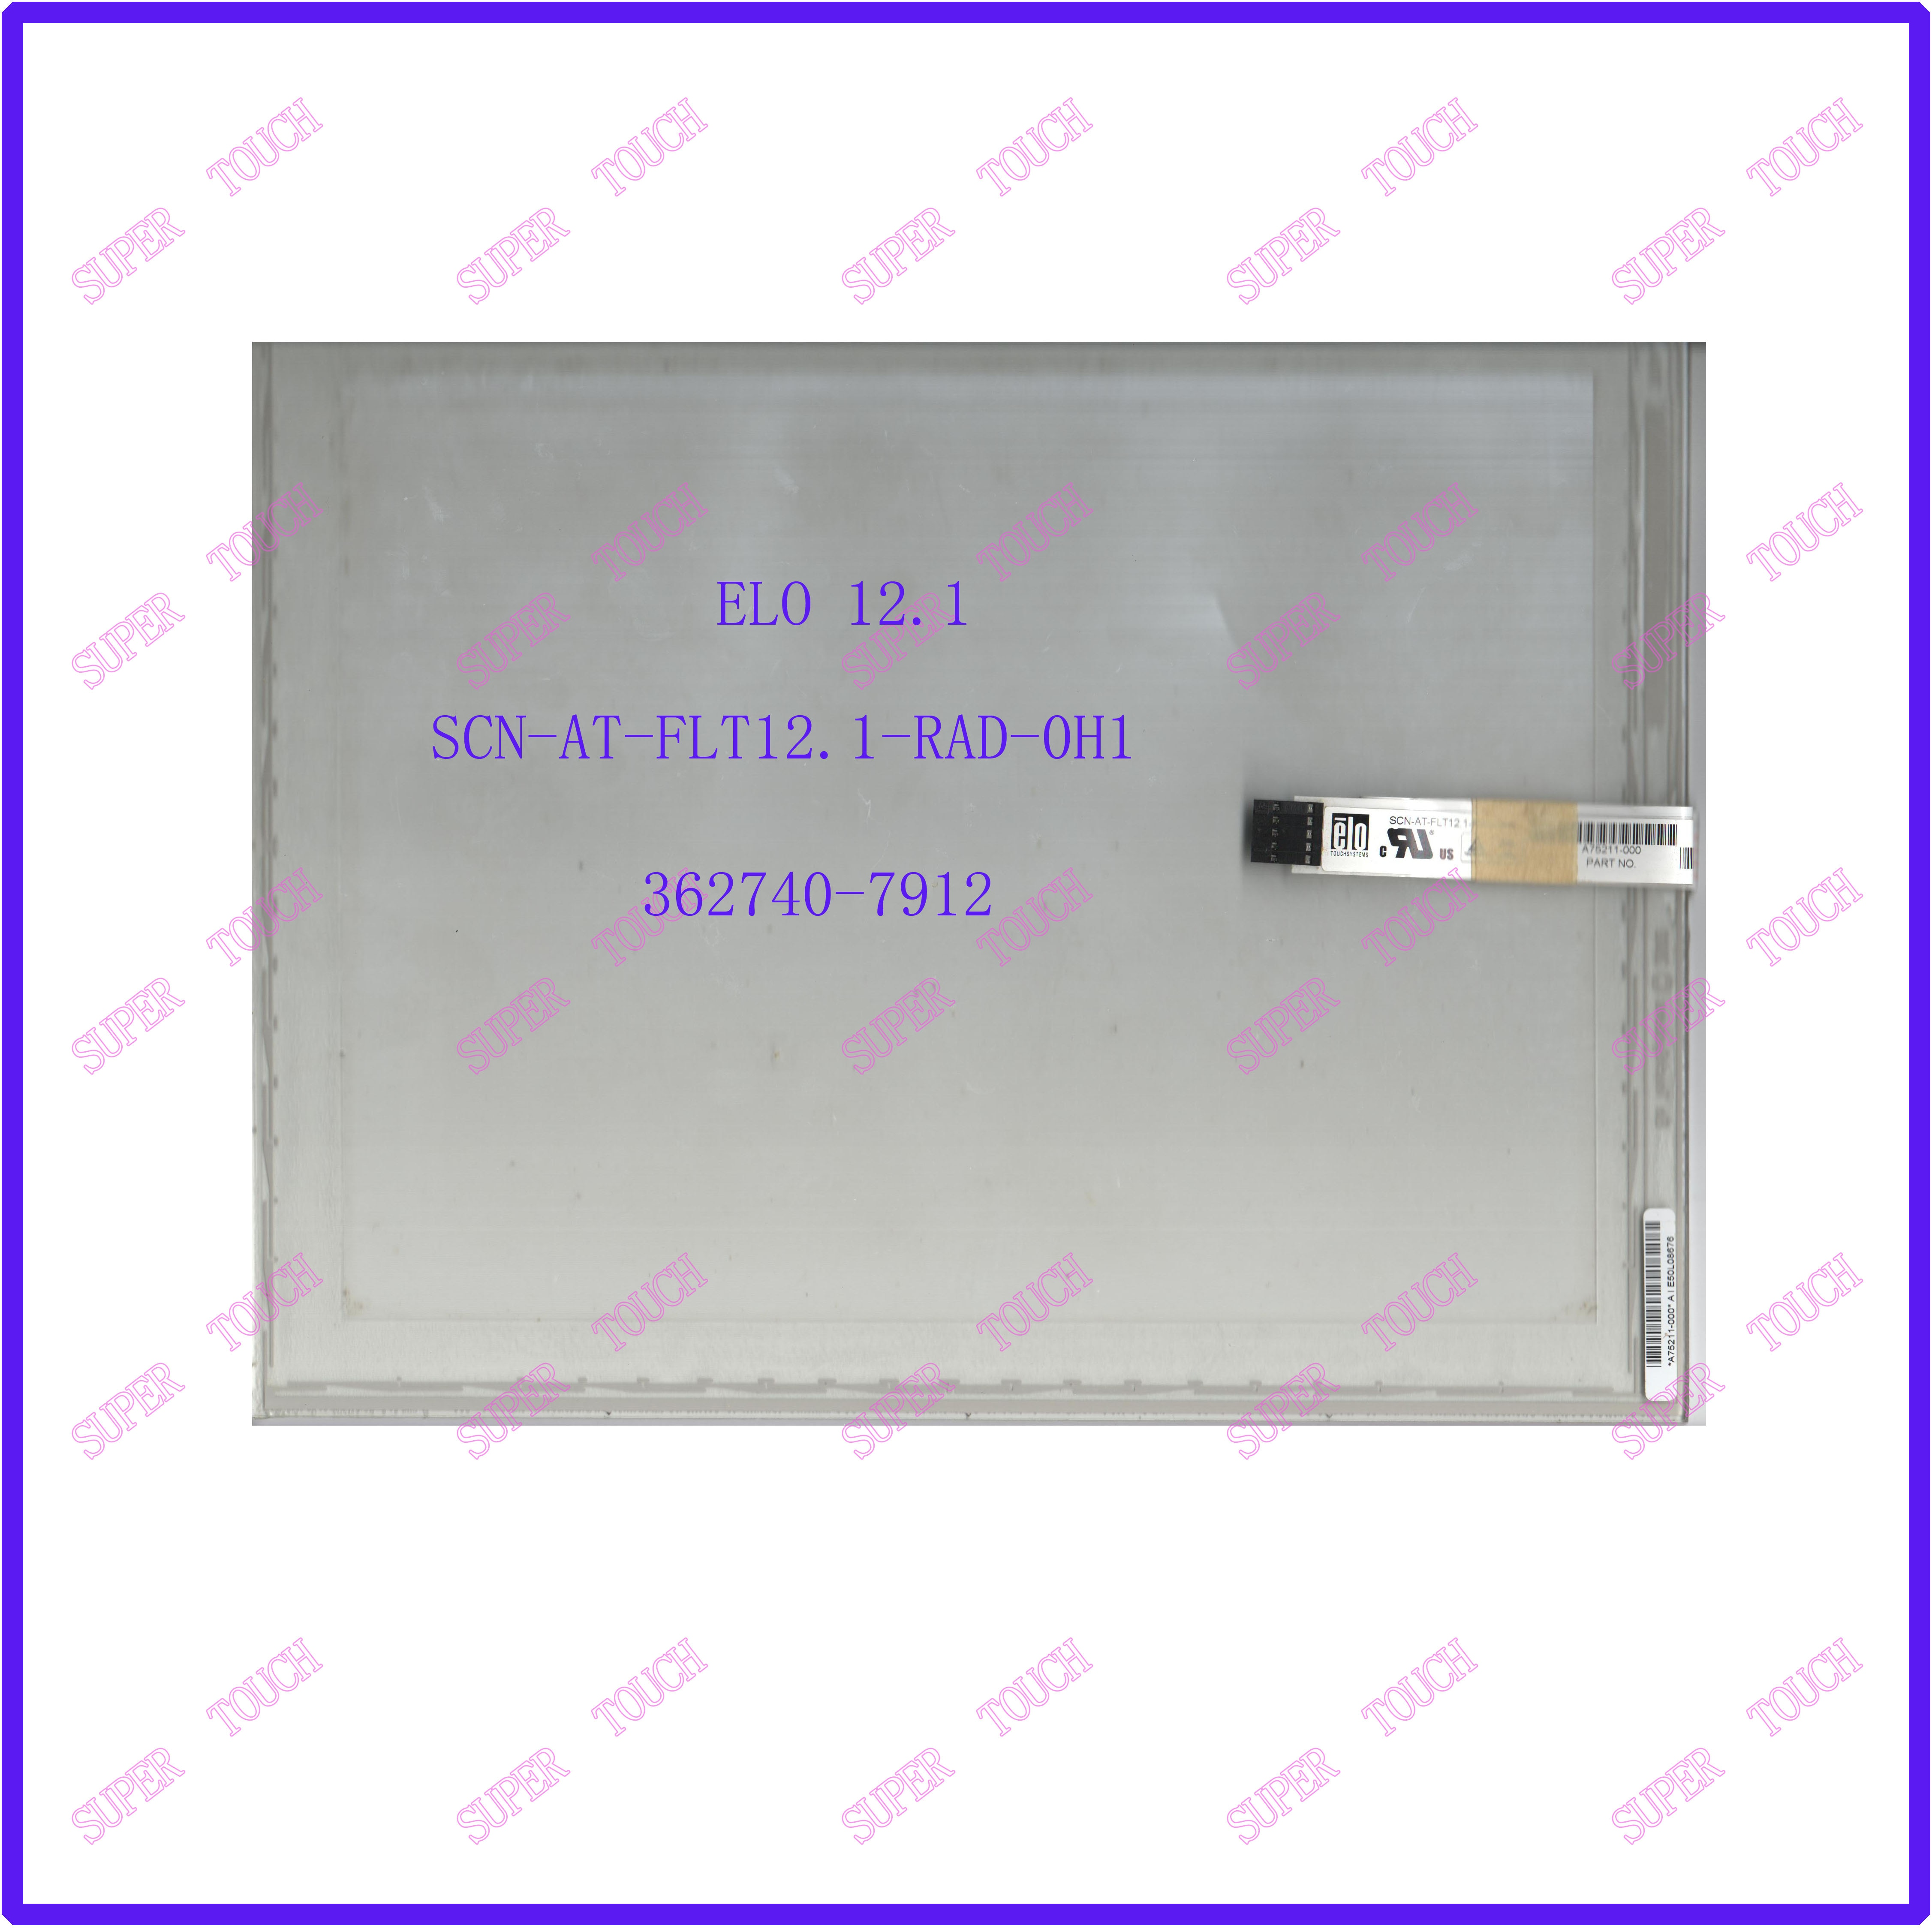 Original nuevo ELO 10,4 pantalla táctil Taiwán original cinco cables industrial control pantalla SCN-A5-FLT10.4-004-0H1